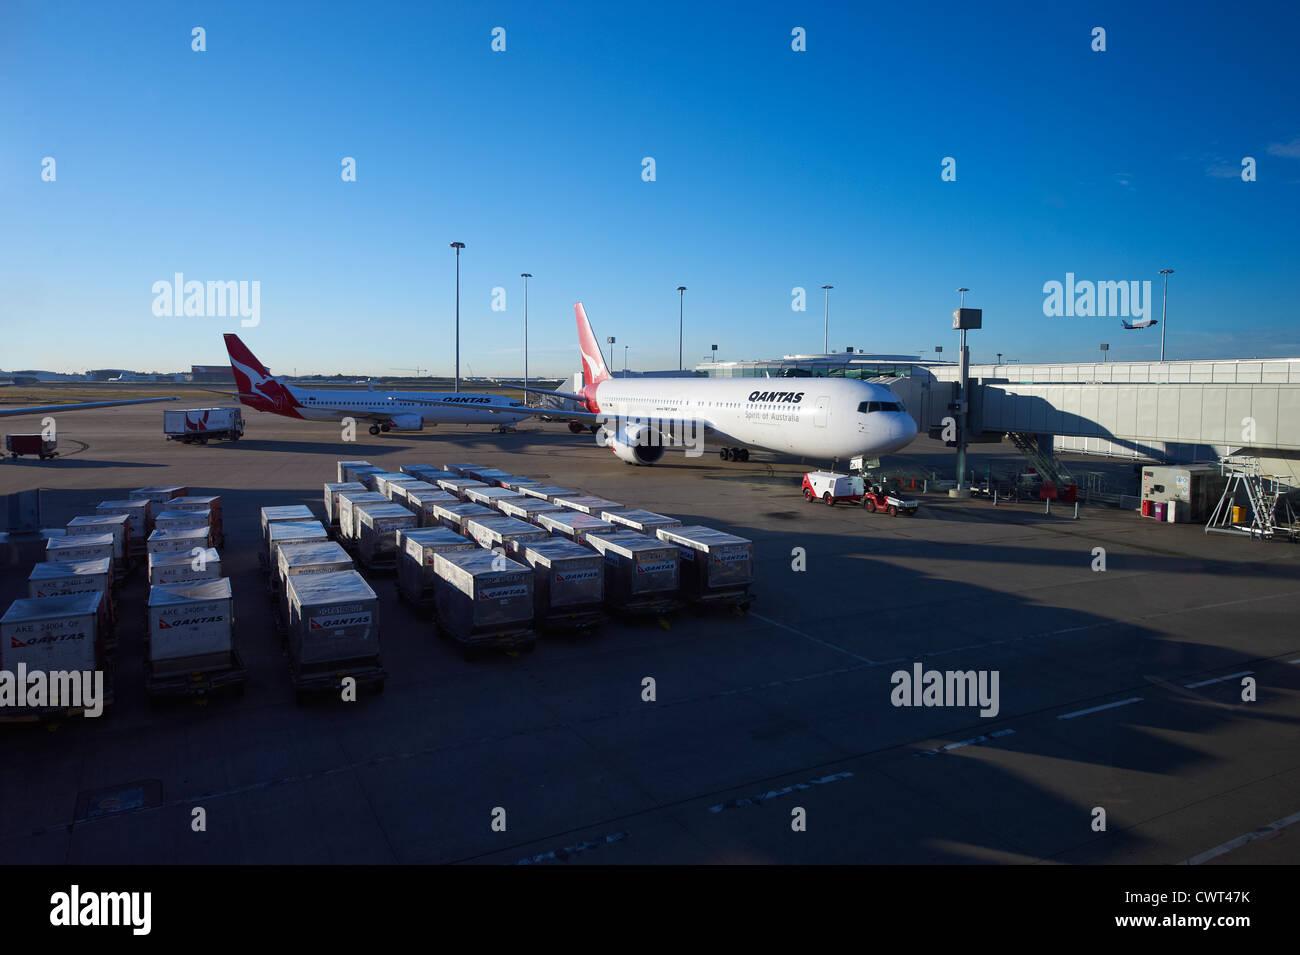 Qantas aircraft at Brisbane Domestic Terminal Australia - Stock Image